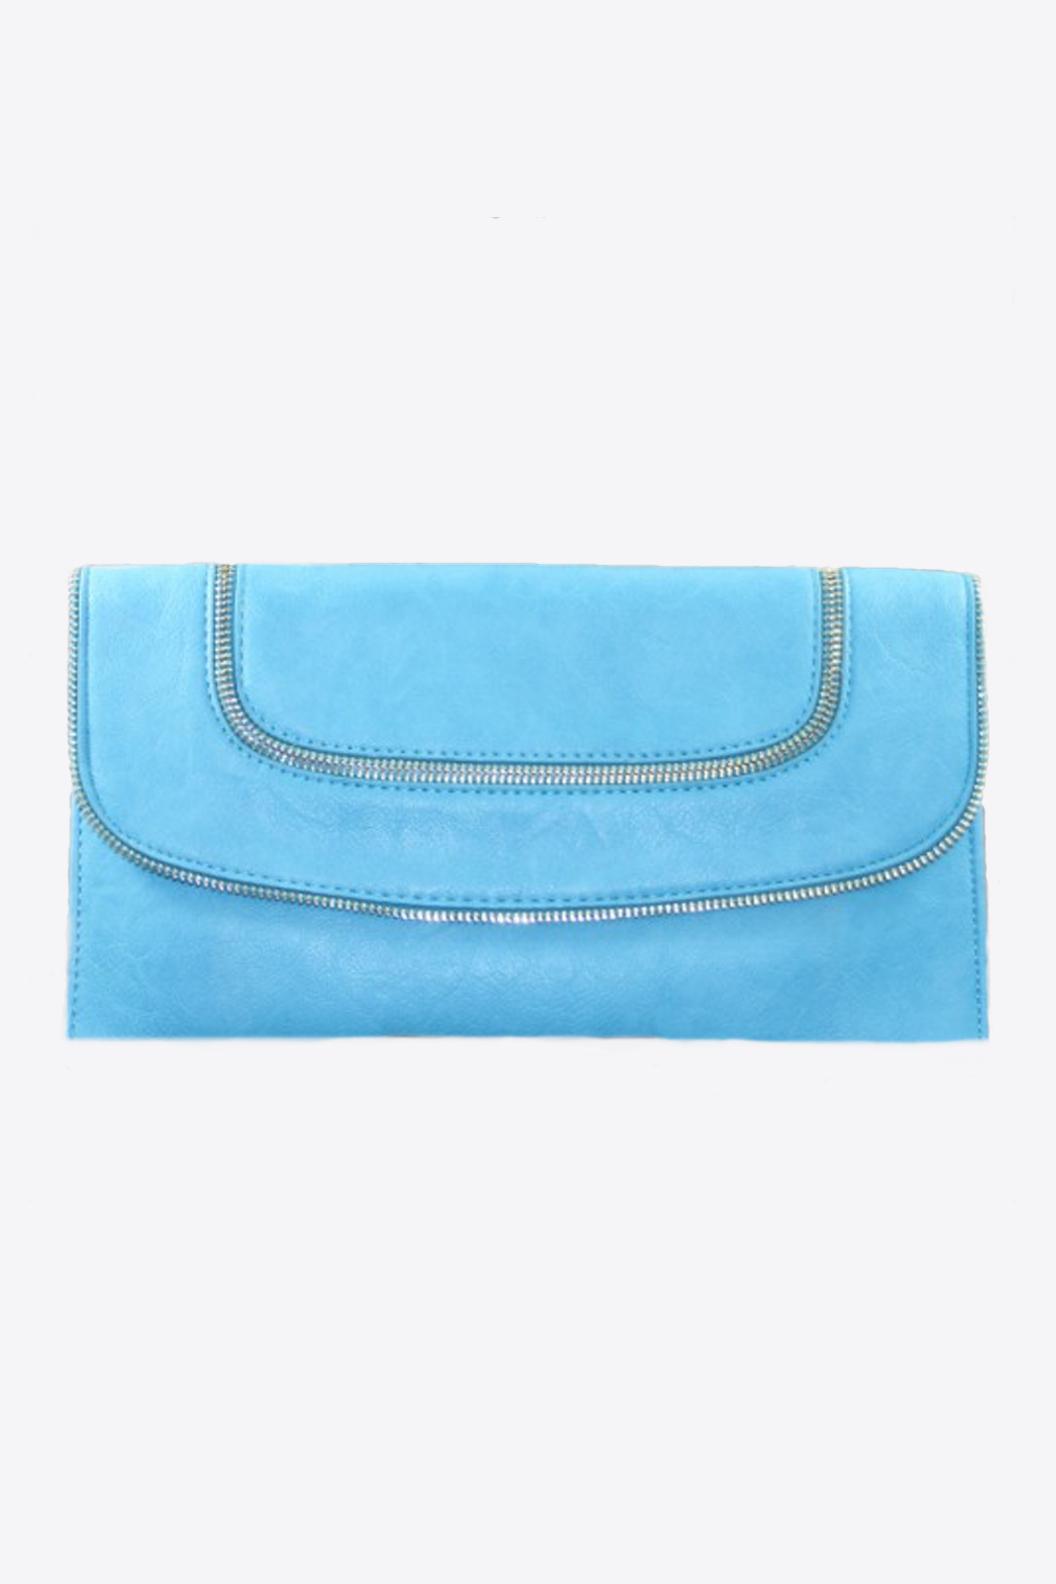 Blue Leather Clutch w Zipper Accents